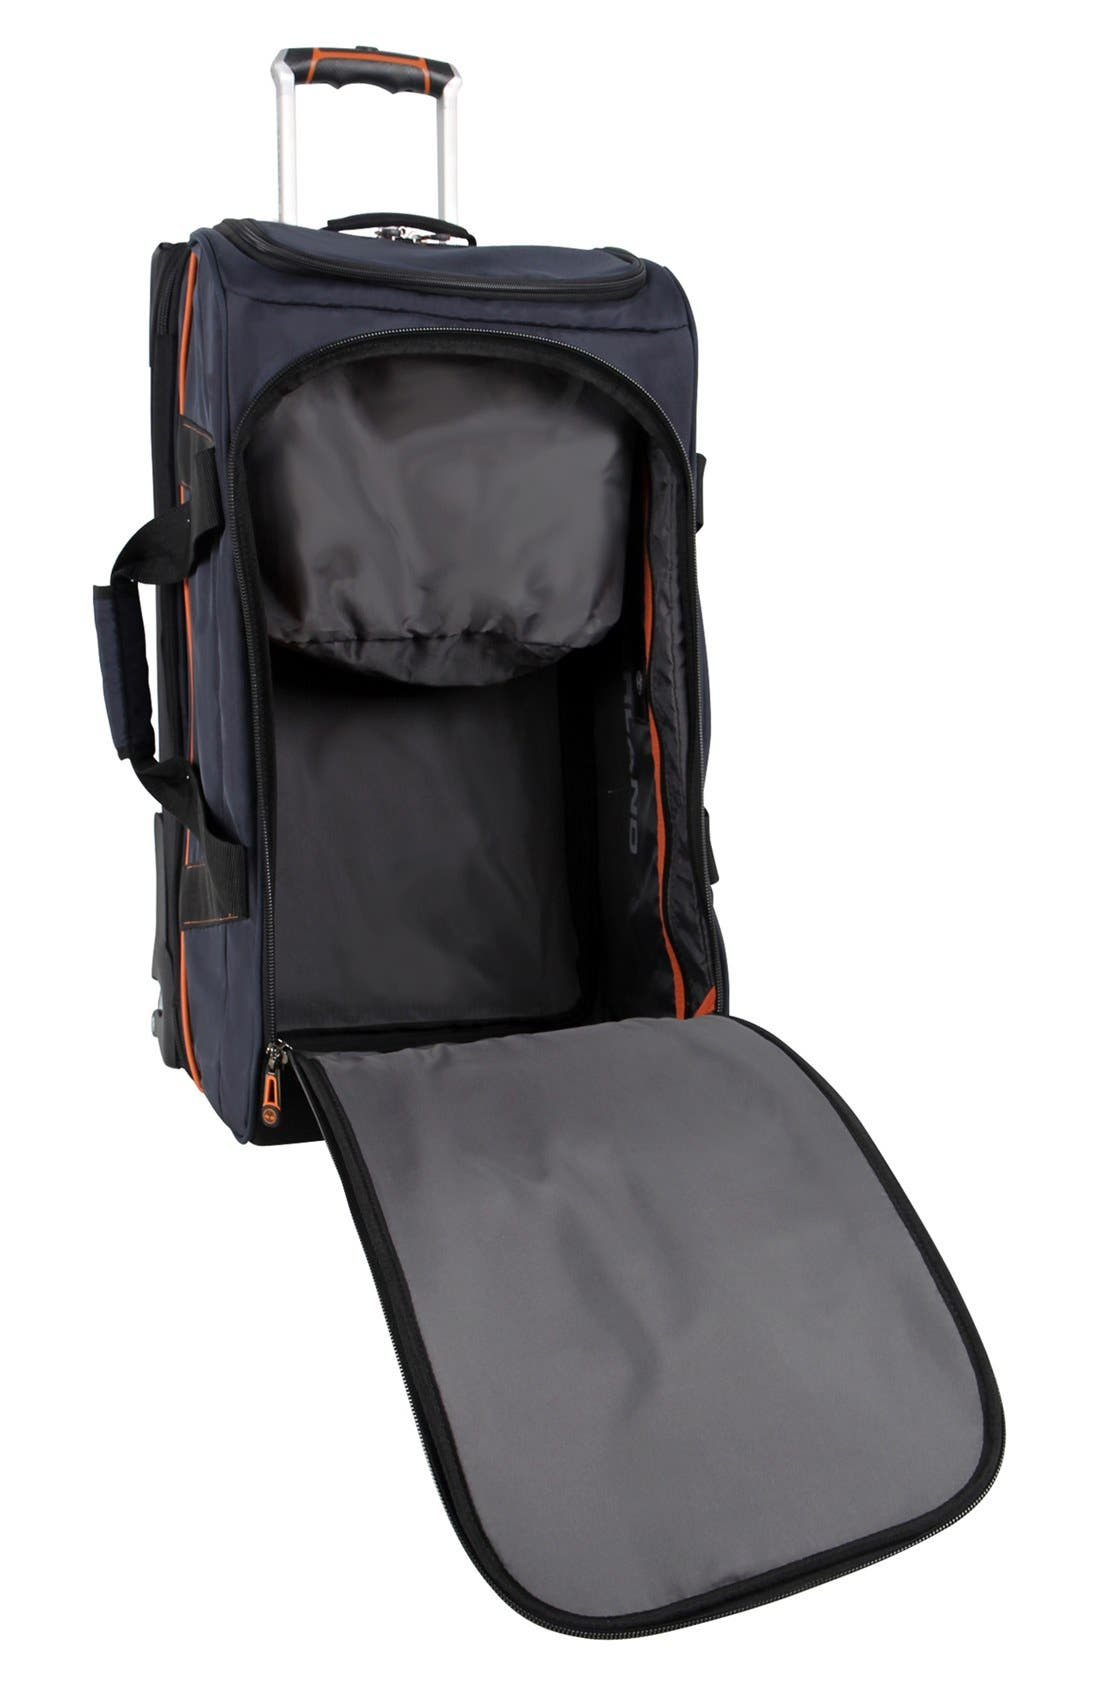 Alternate Image 2  - Timberland 'Mascoma' Rolling Duffel Bag (26 Inch)